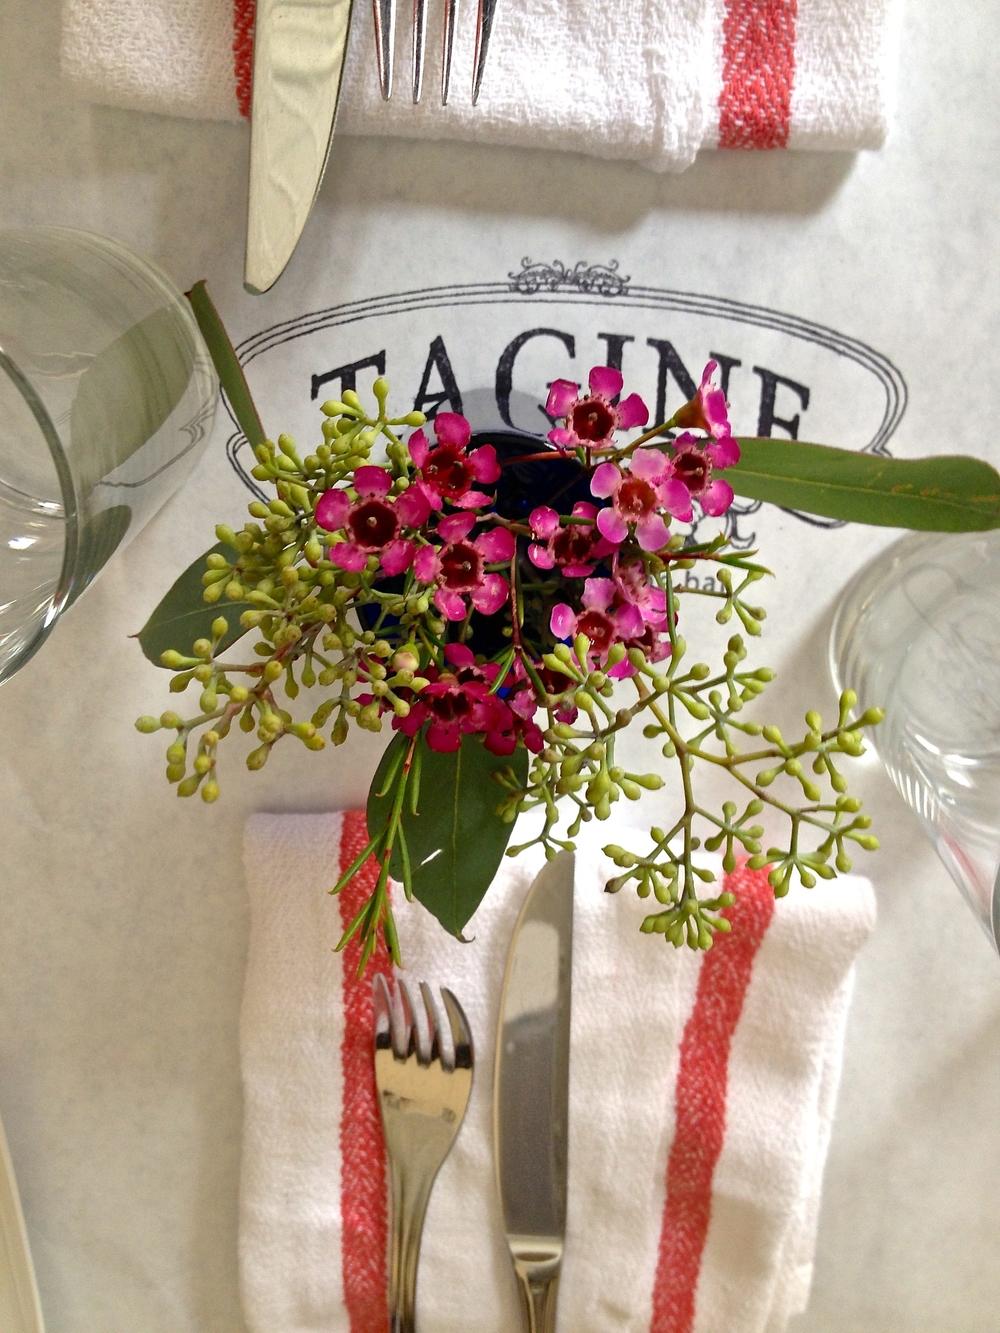 tagine restaurant & wine bar, croton on hudson, ny